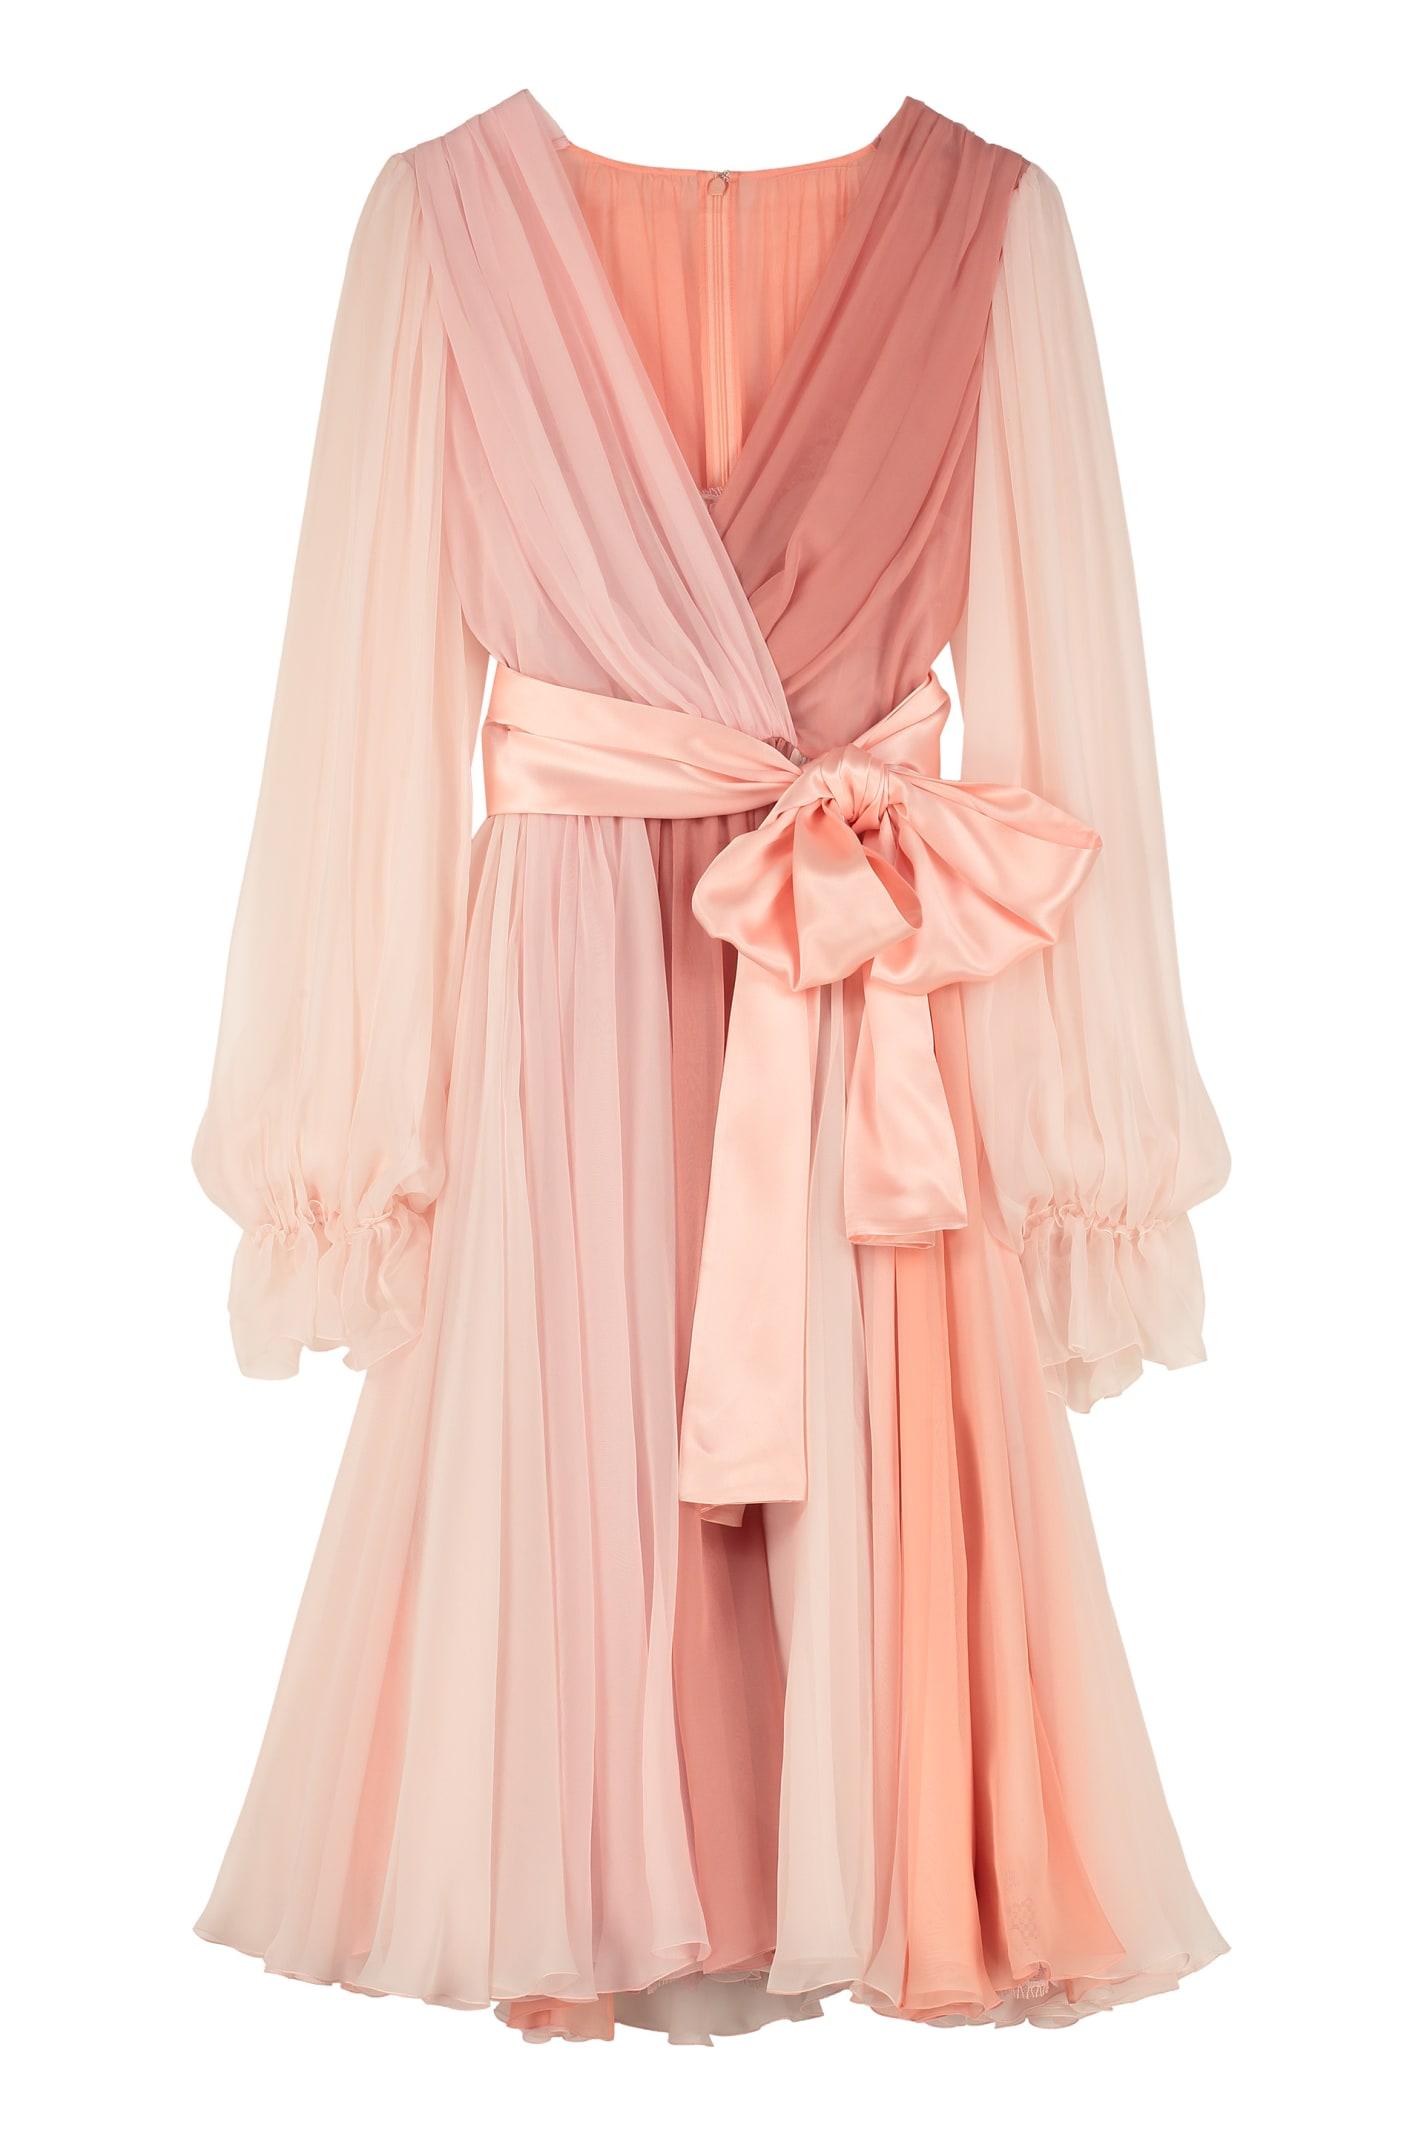 Buy Dolce & Gabbana Chiffon Dress online, shop Dolce & Gabbana with free shipping